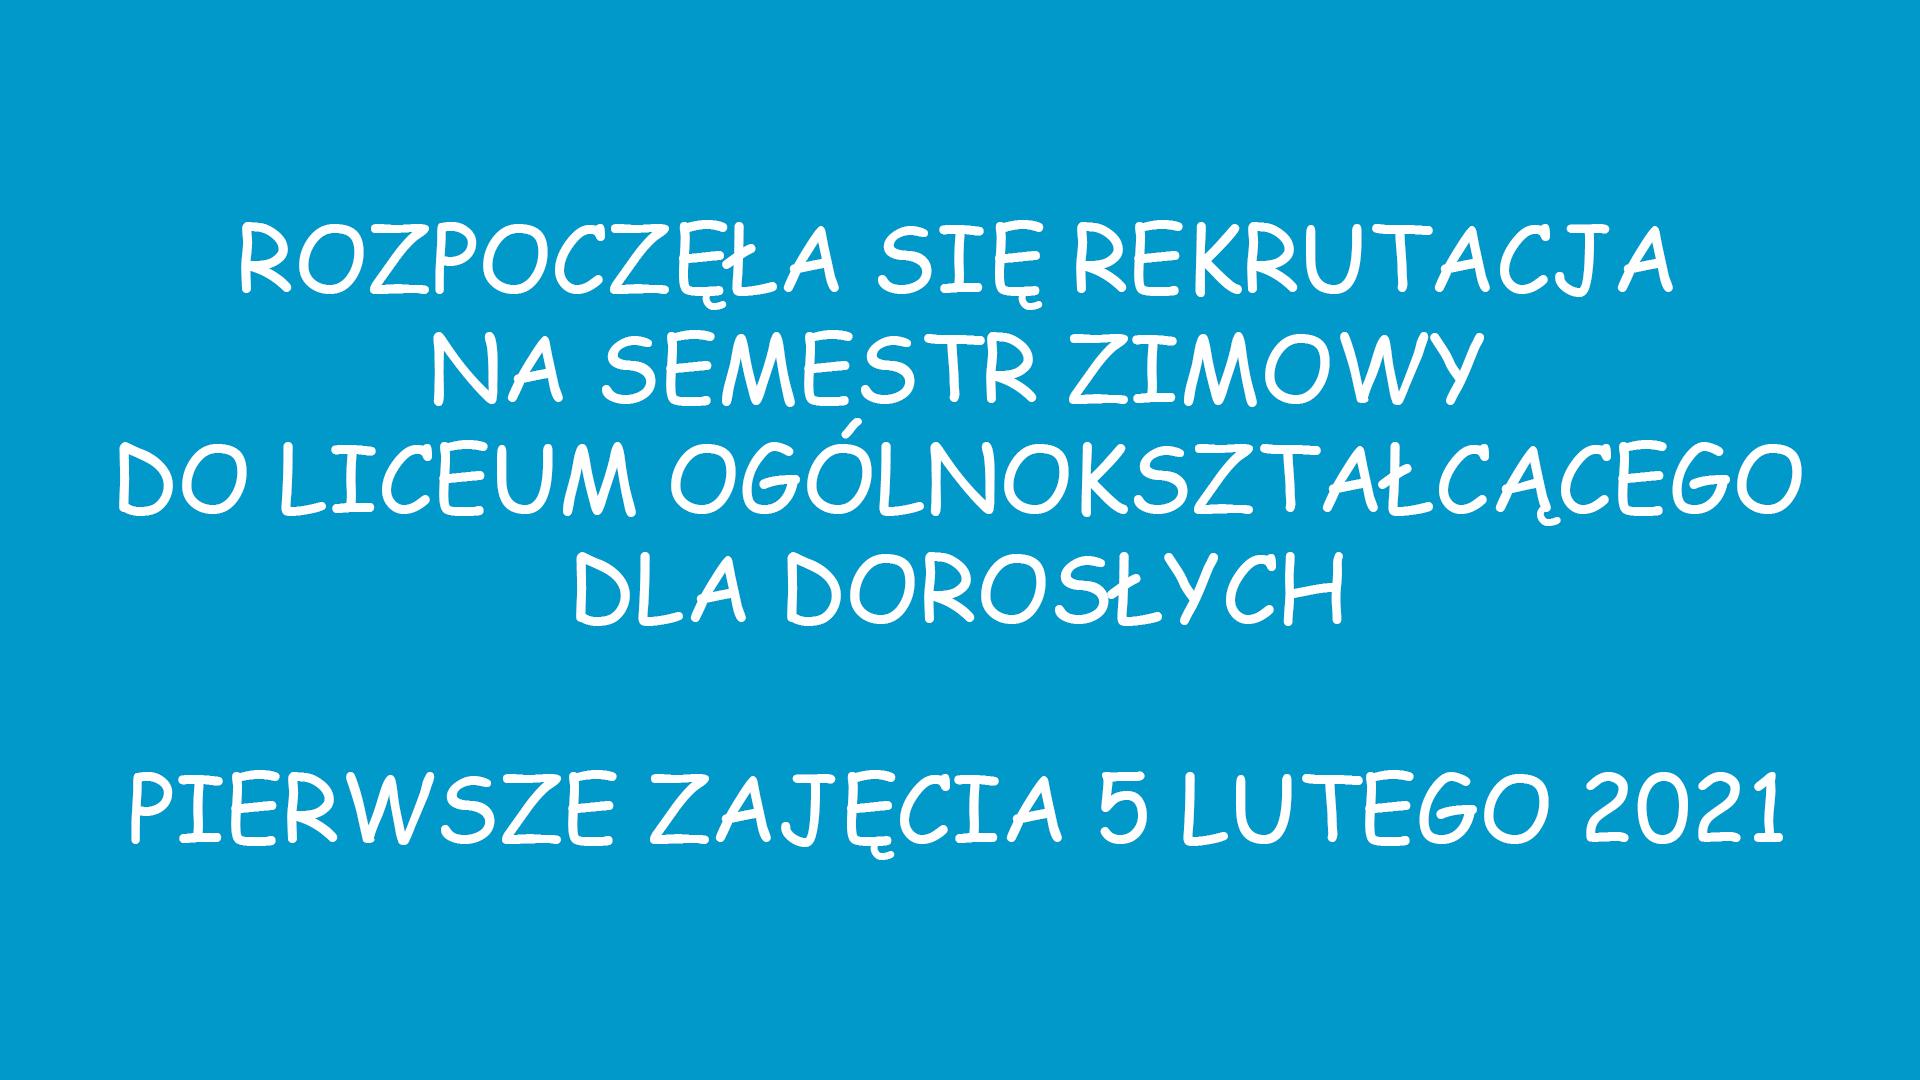 REKRUTACJA SEMESTR ZIMOWY